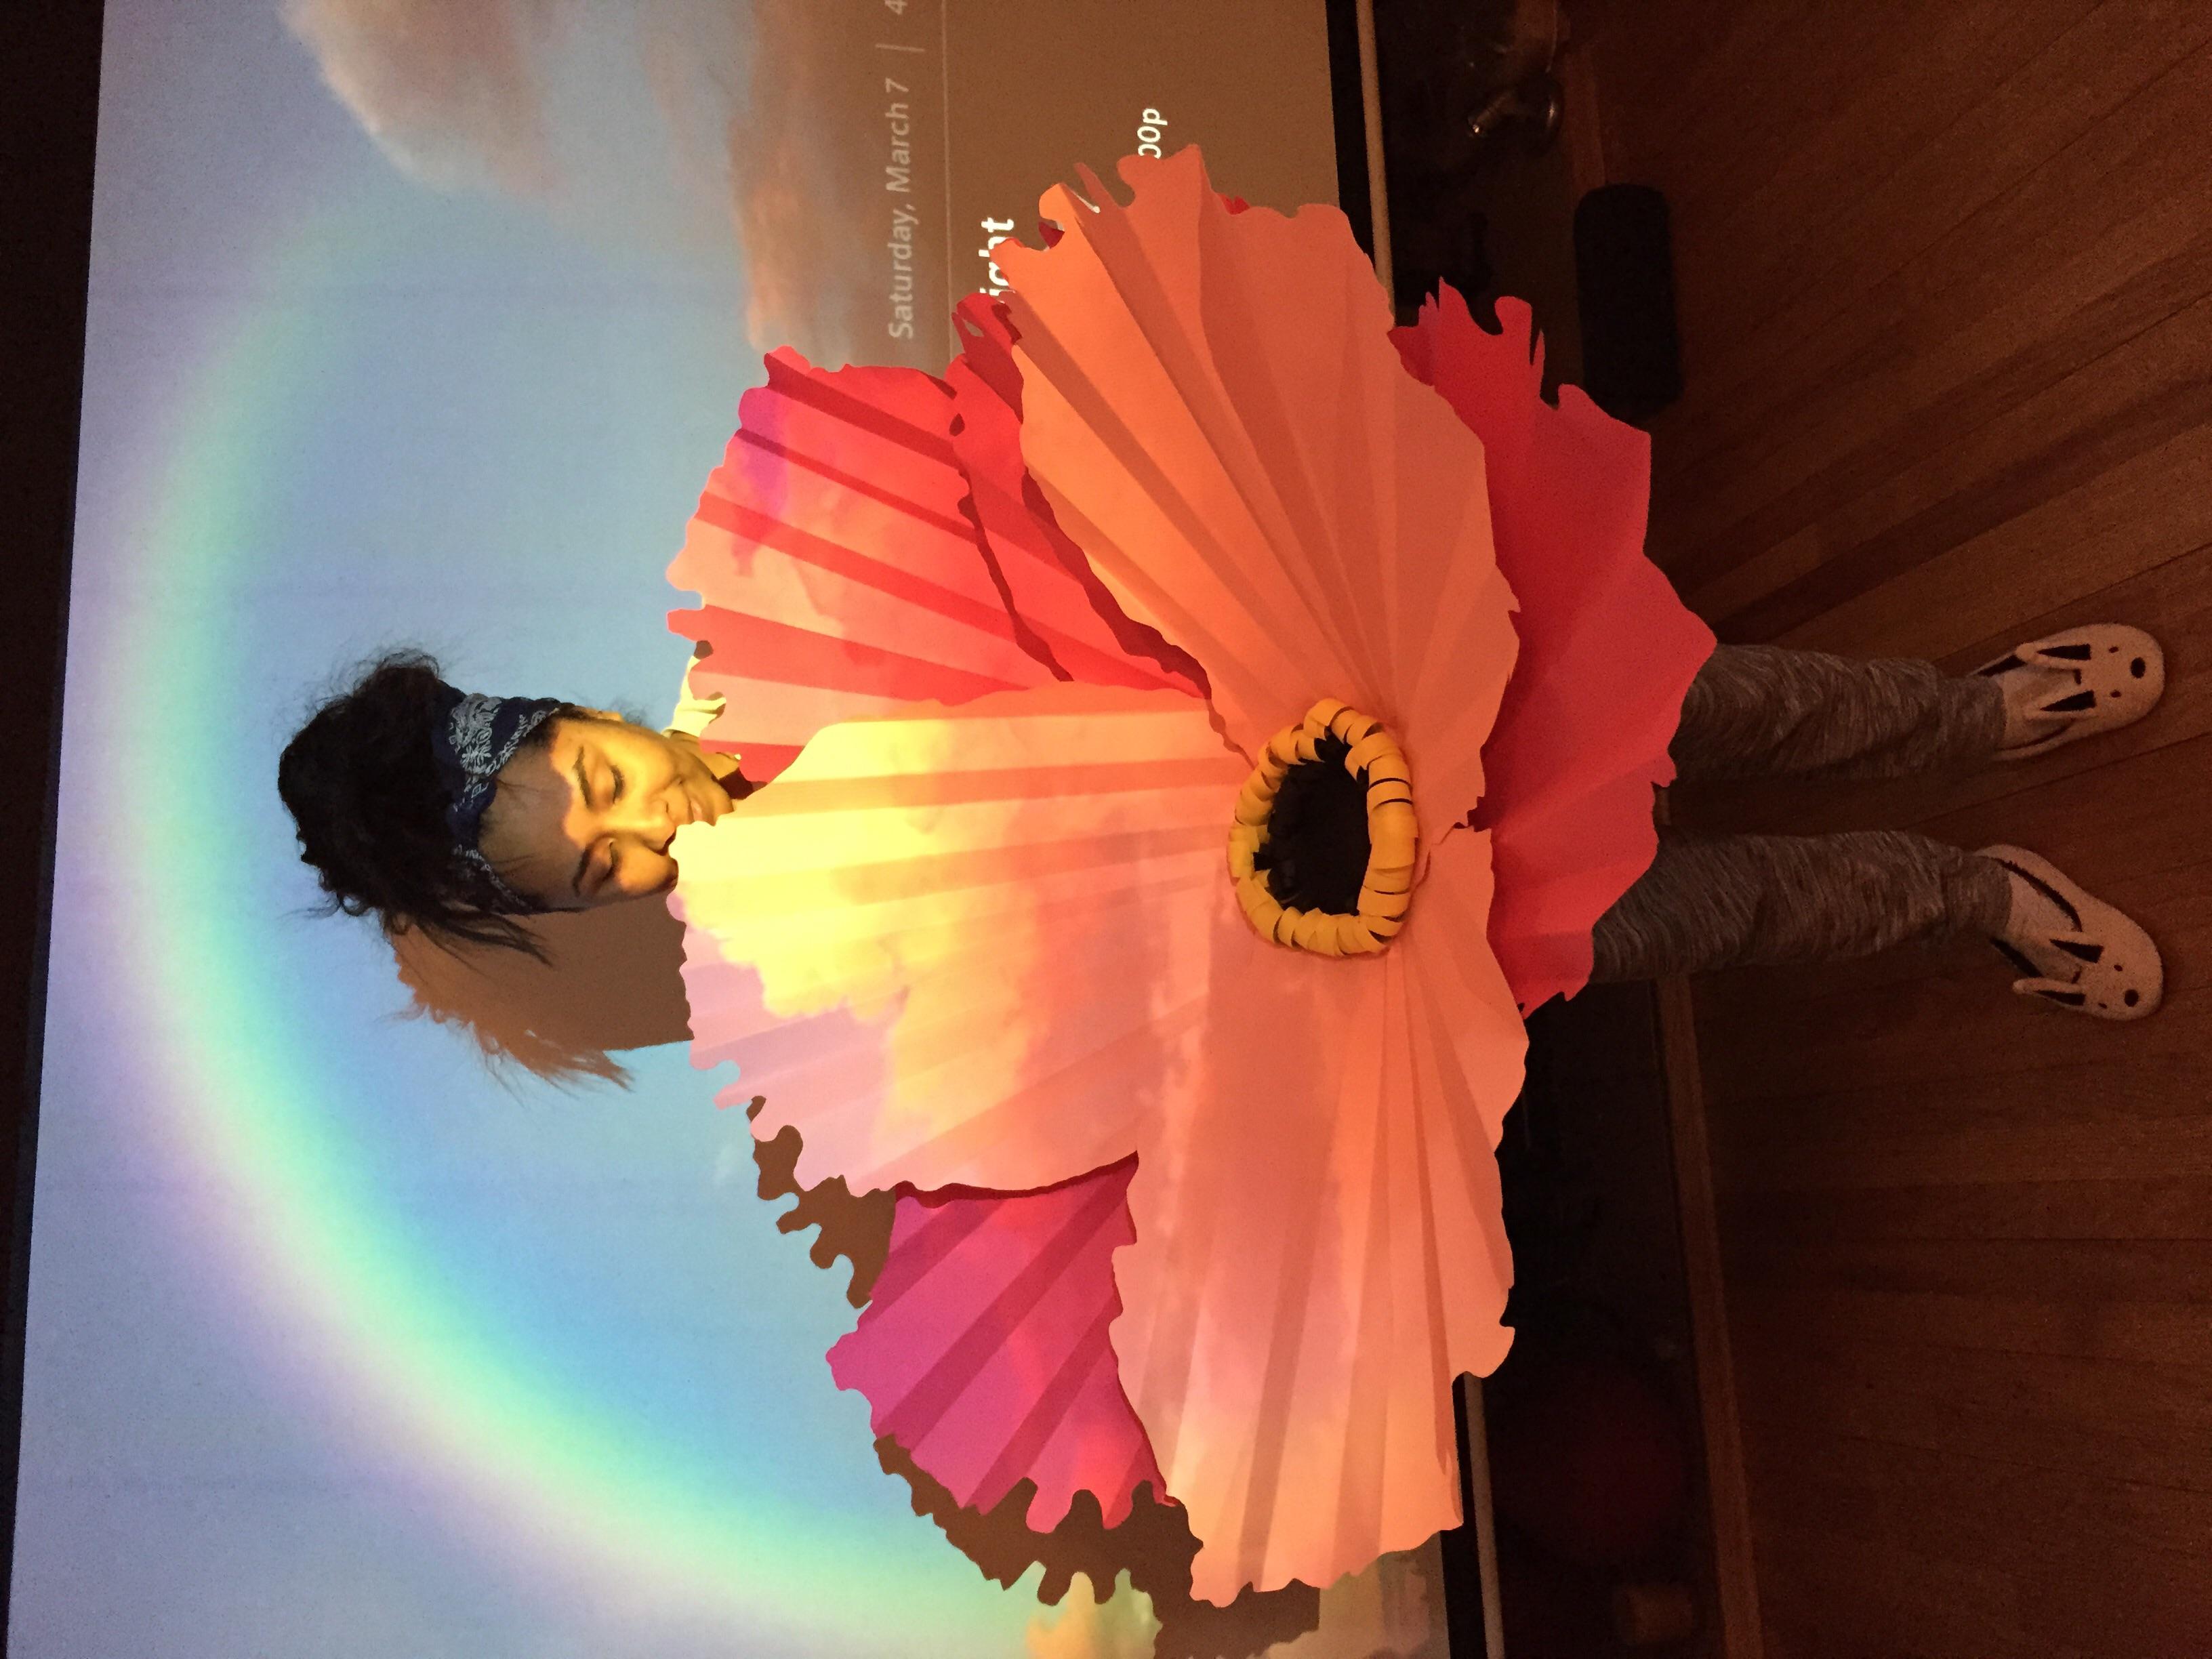 Giant flower centerpiece